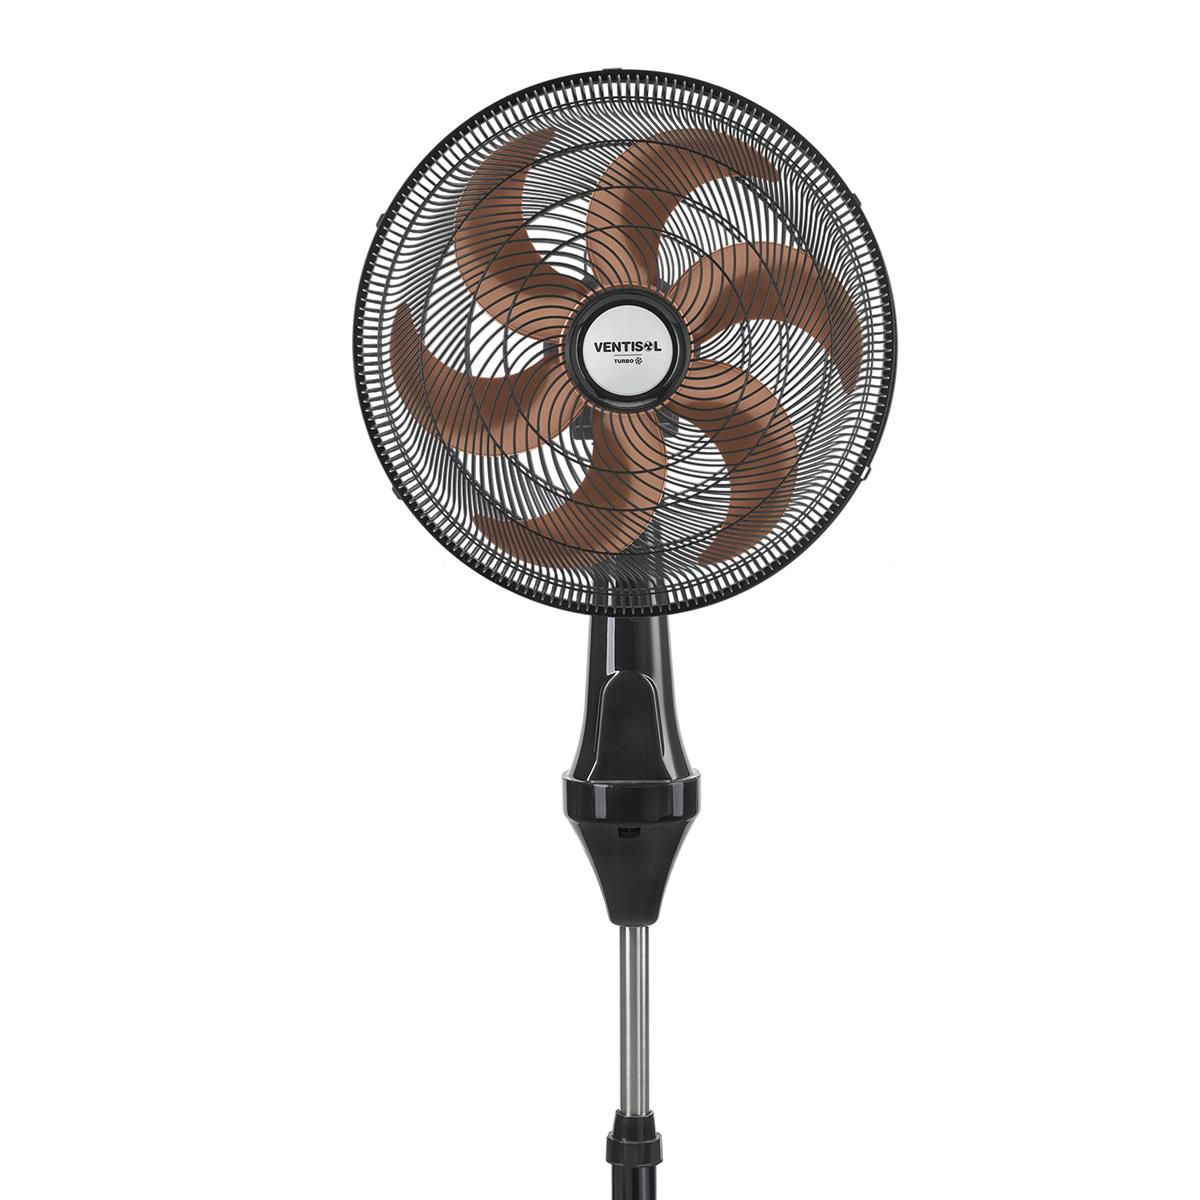 Ventilador de Coluna Turbo 40cm 6 Pás Oscilante Bronze - Ventisol (110V)